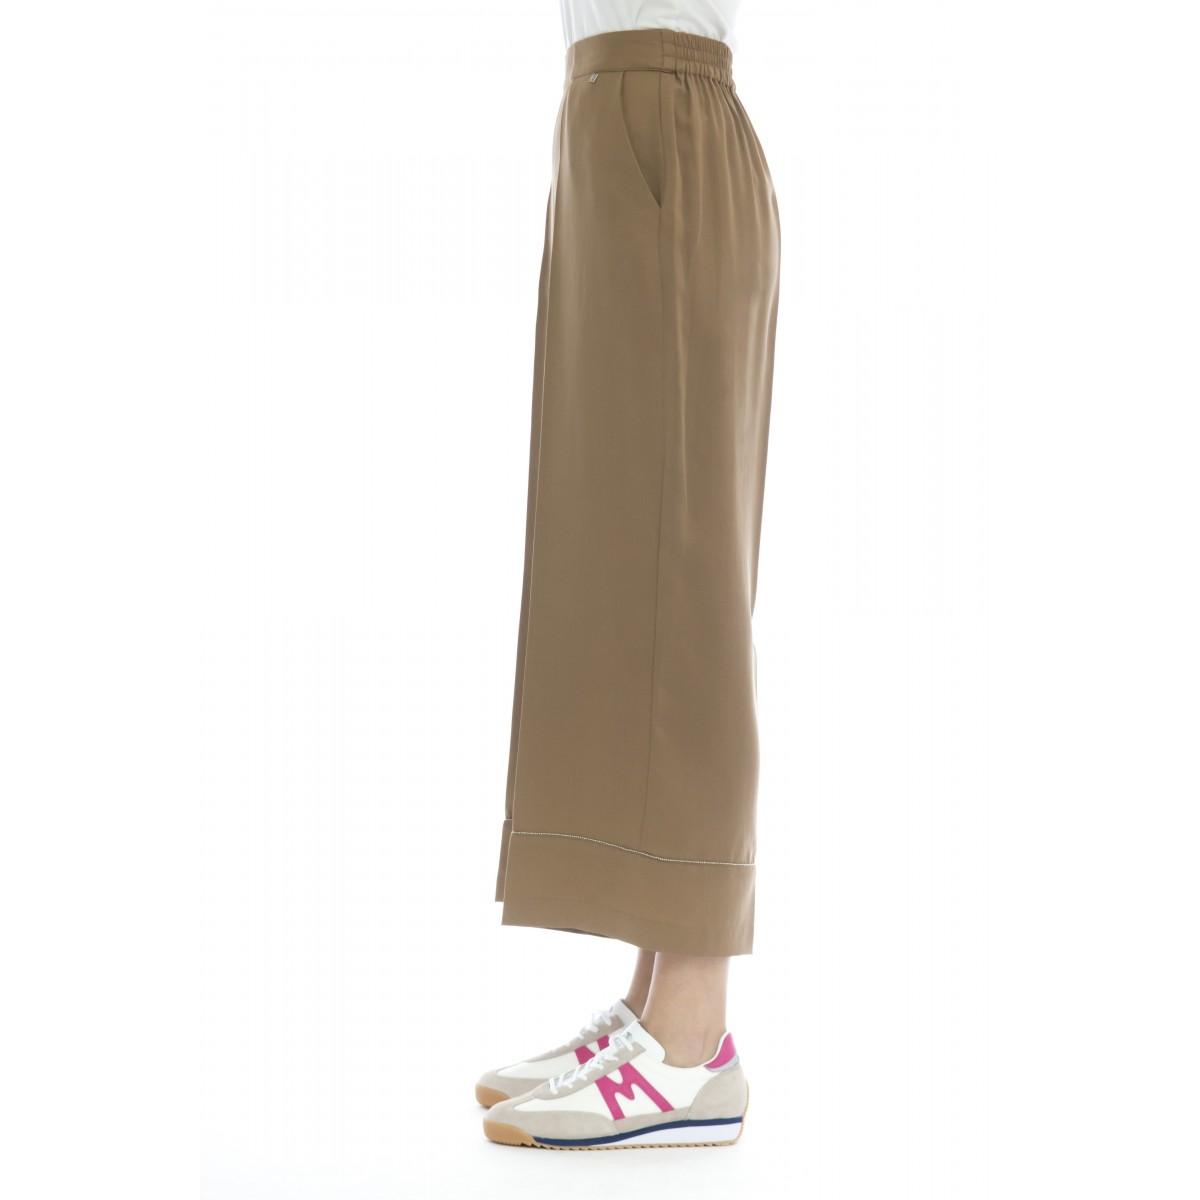 Pantalone donna - Lapse pantalone largo